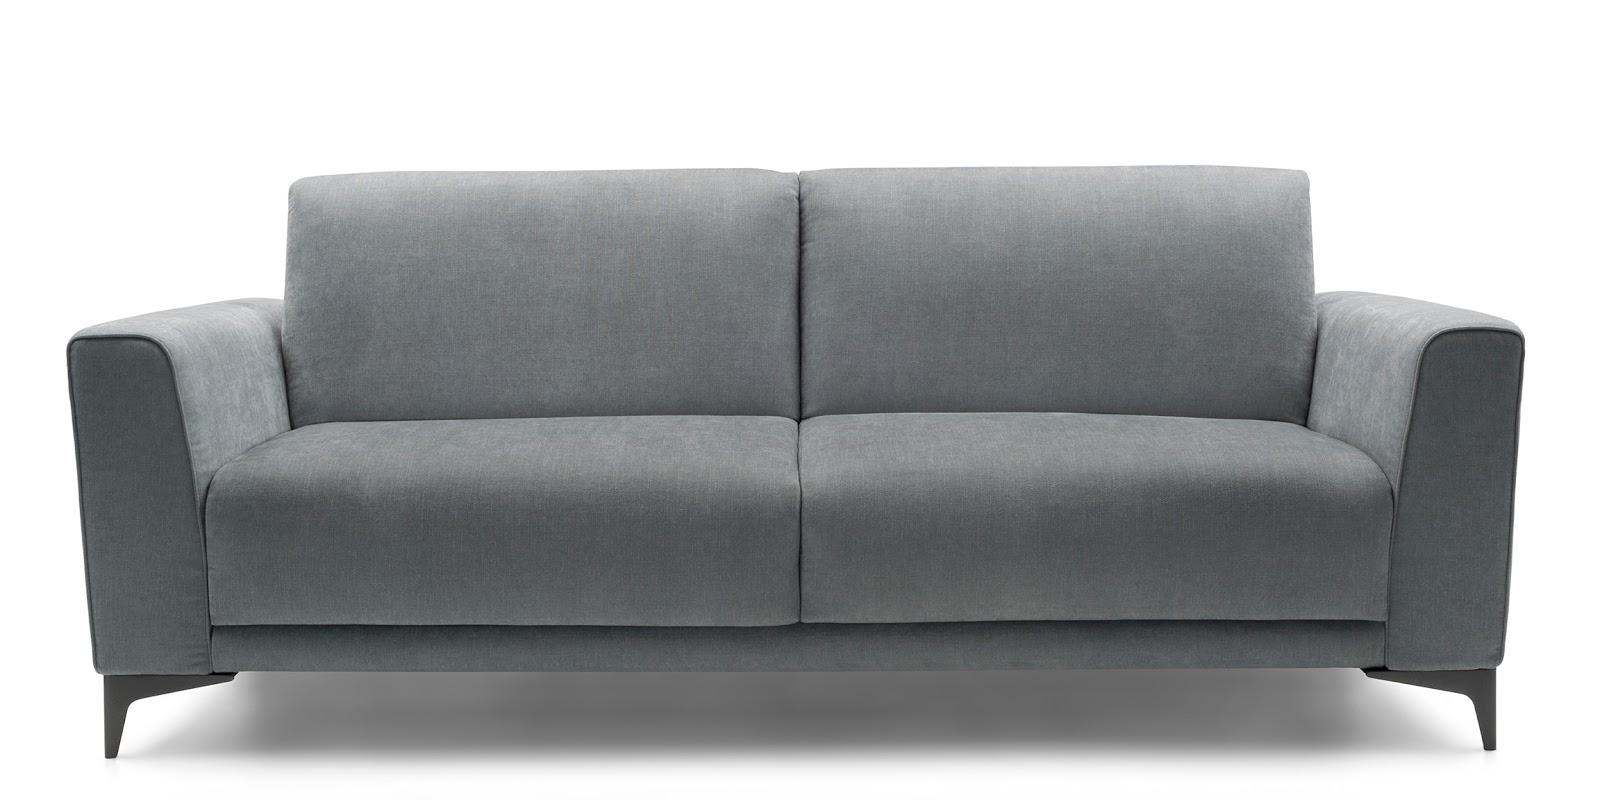 Momentoitalia Italian furniture  blog News from the 2016 Milan Design Week  new modern sofa beds